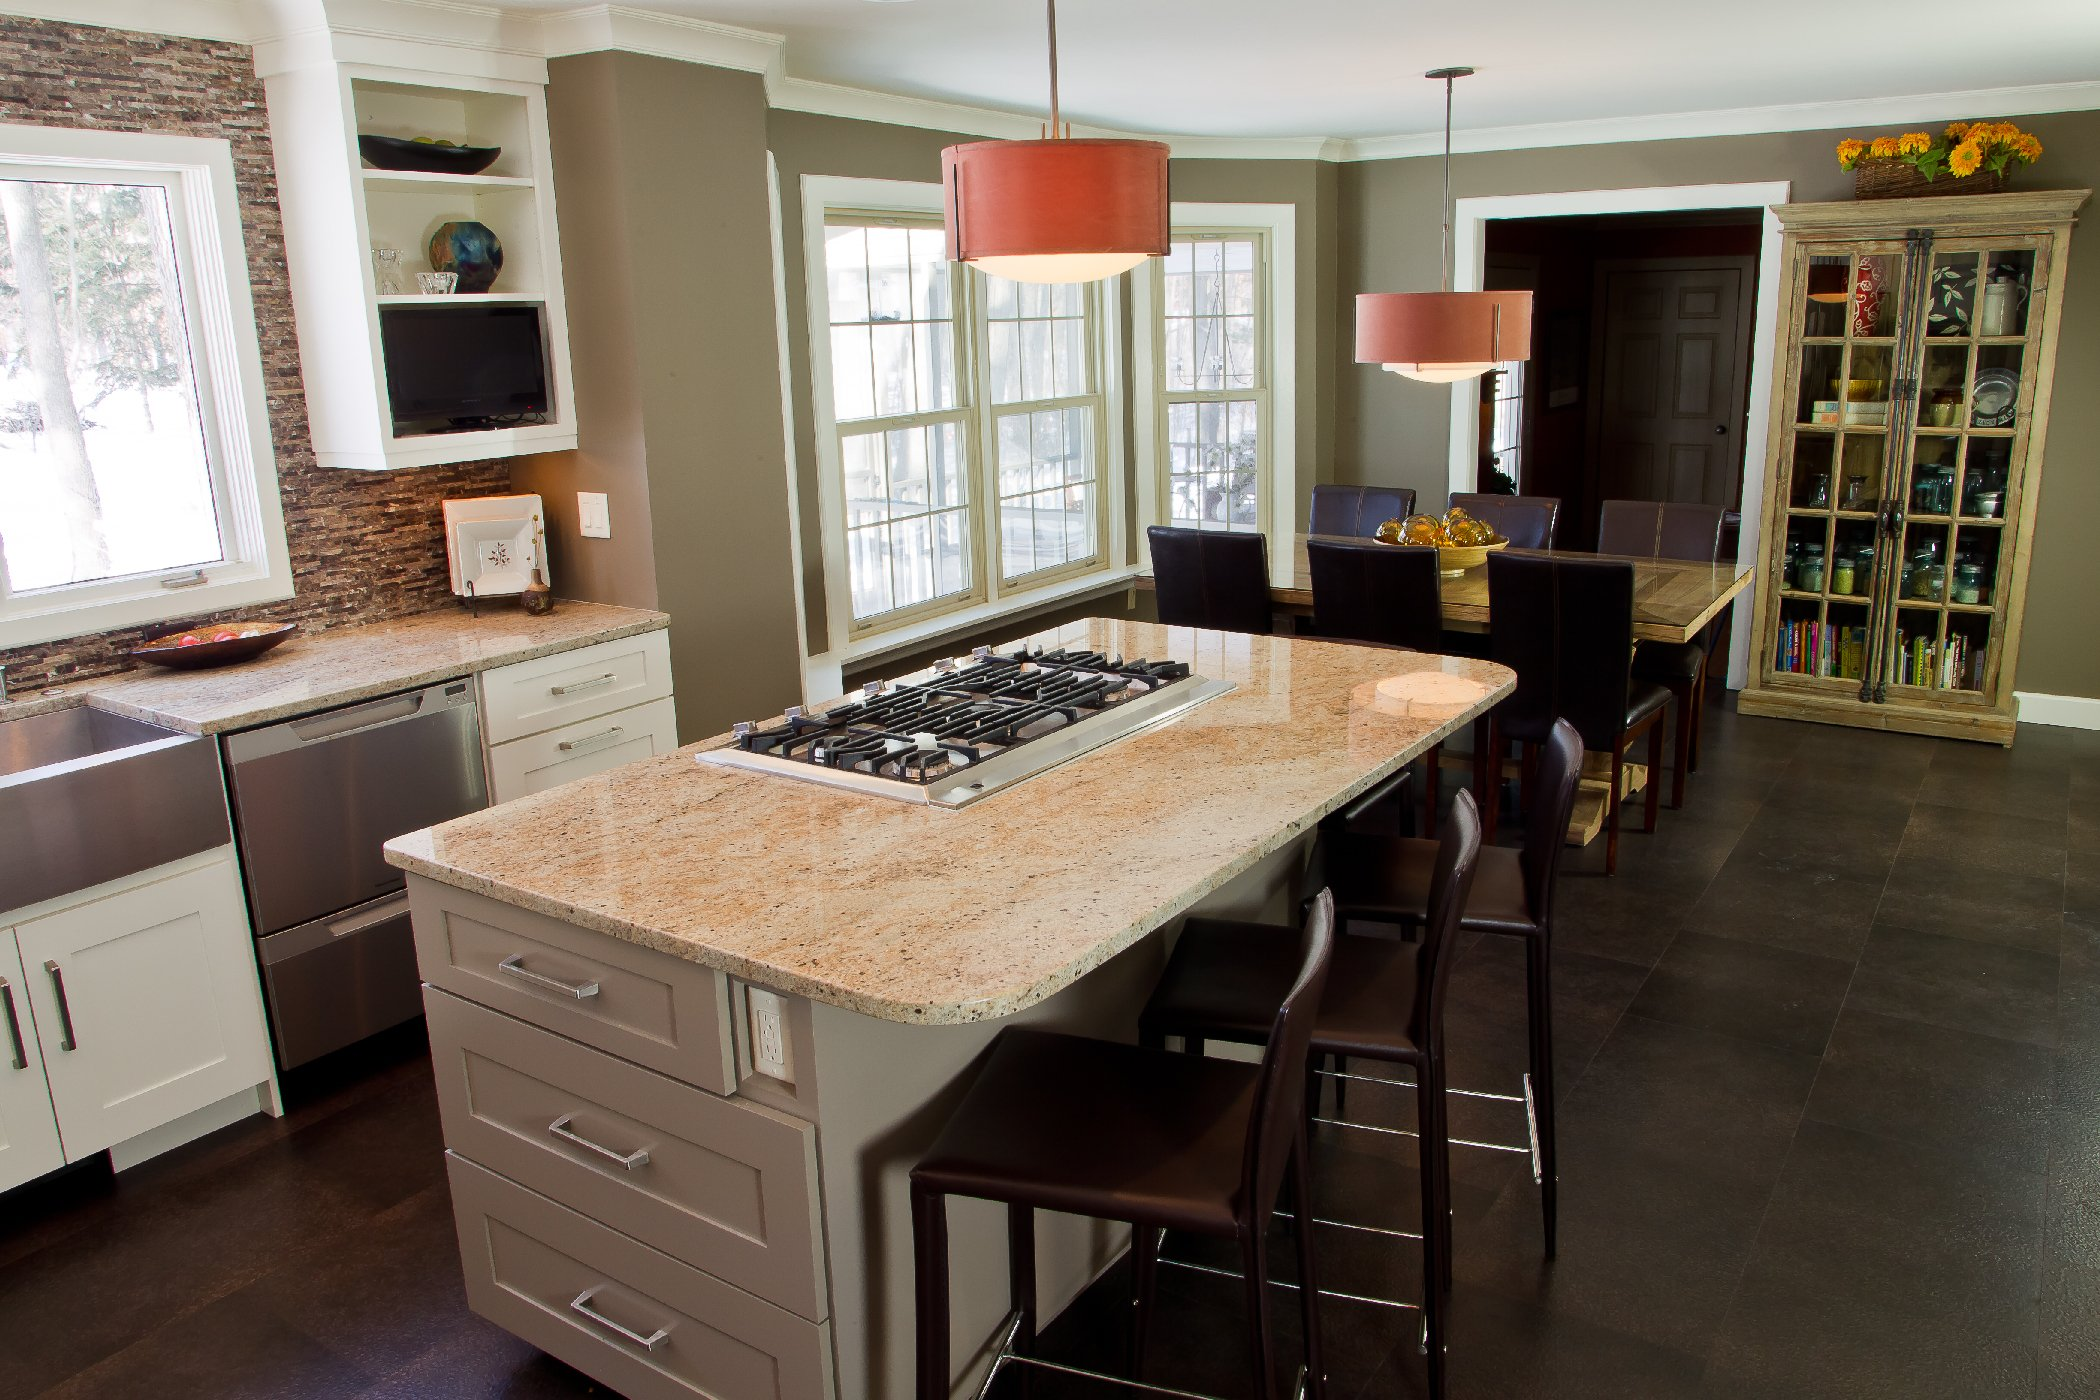 Kitchen Remodeling and Design, white kitchen design madison wi, orange and white granite, large kitchen island, shaker style kitchen cabinets, orange kitchen pendant, white trim, white crown molding, dark brown cork flooring,